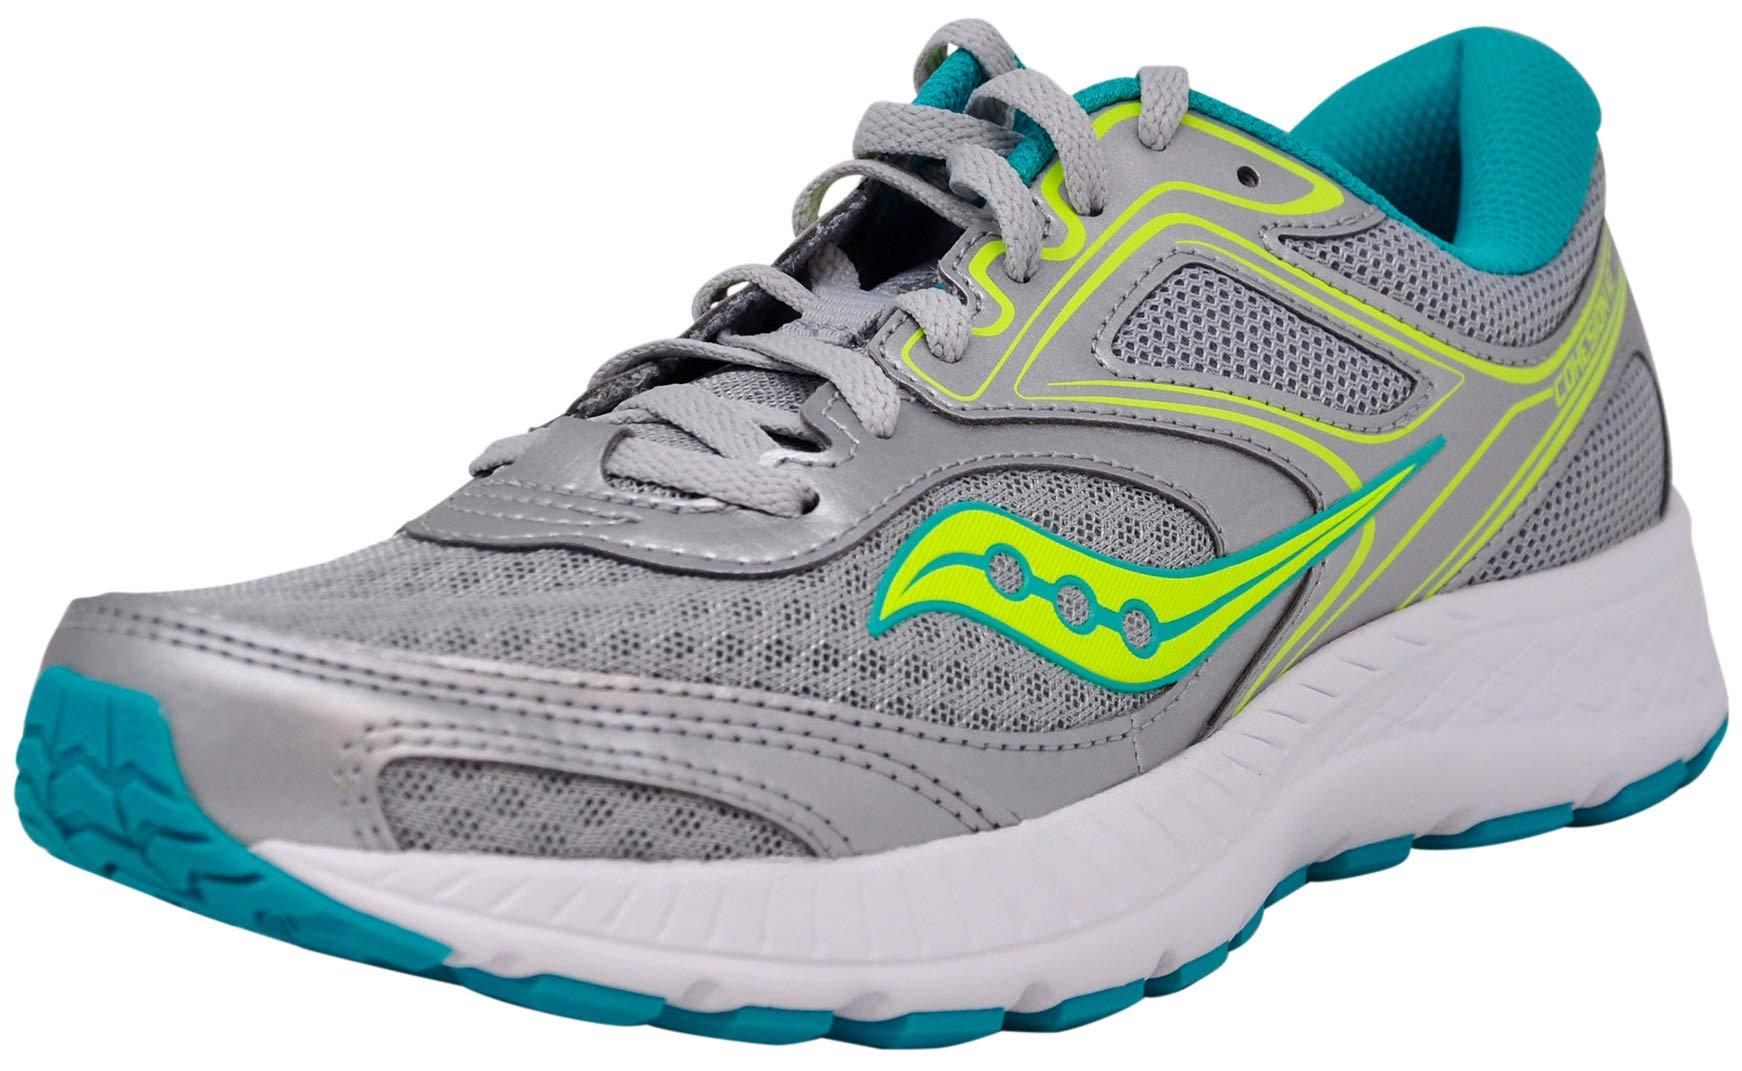 Saucony Women's VERSAFOAM Cohesion 12 Road Running Shoe, Silver/Mint/Citron 6 M US by Saucony